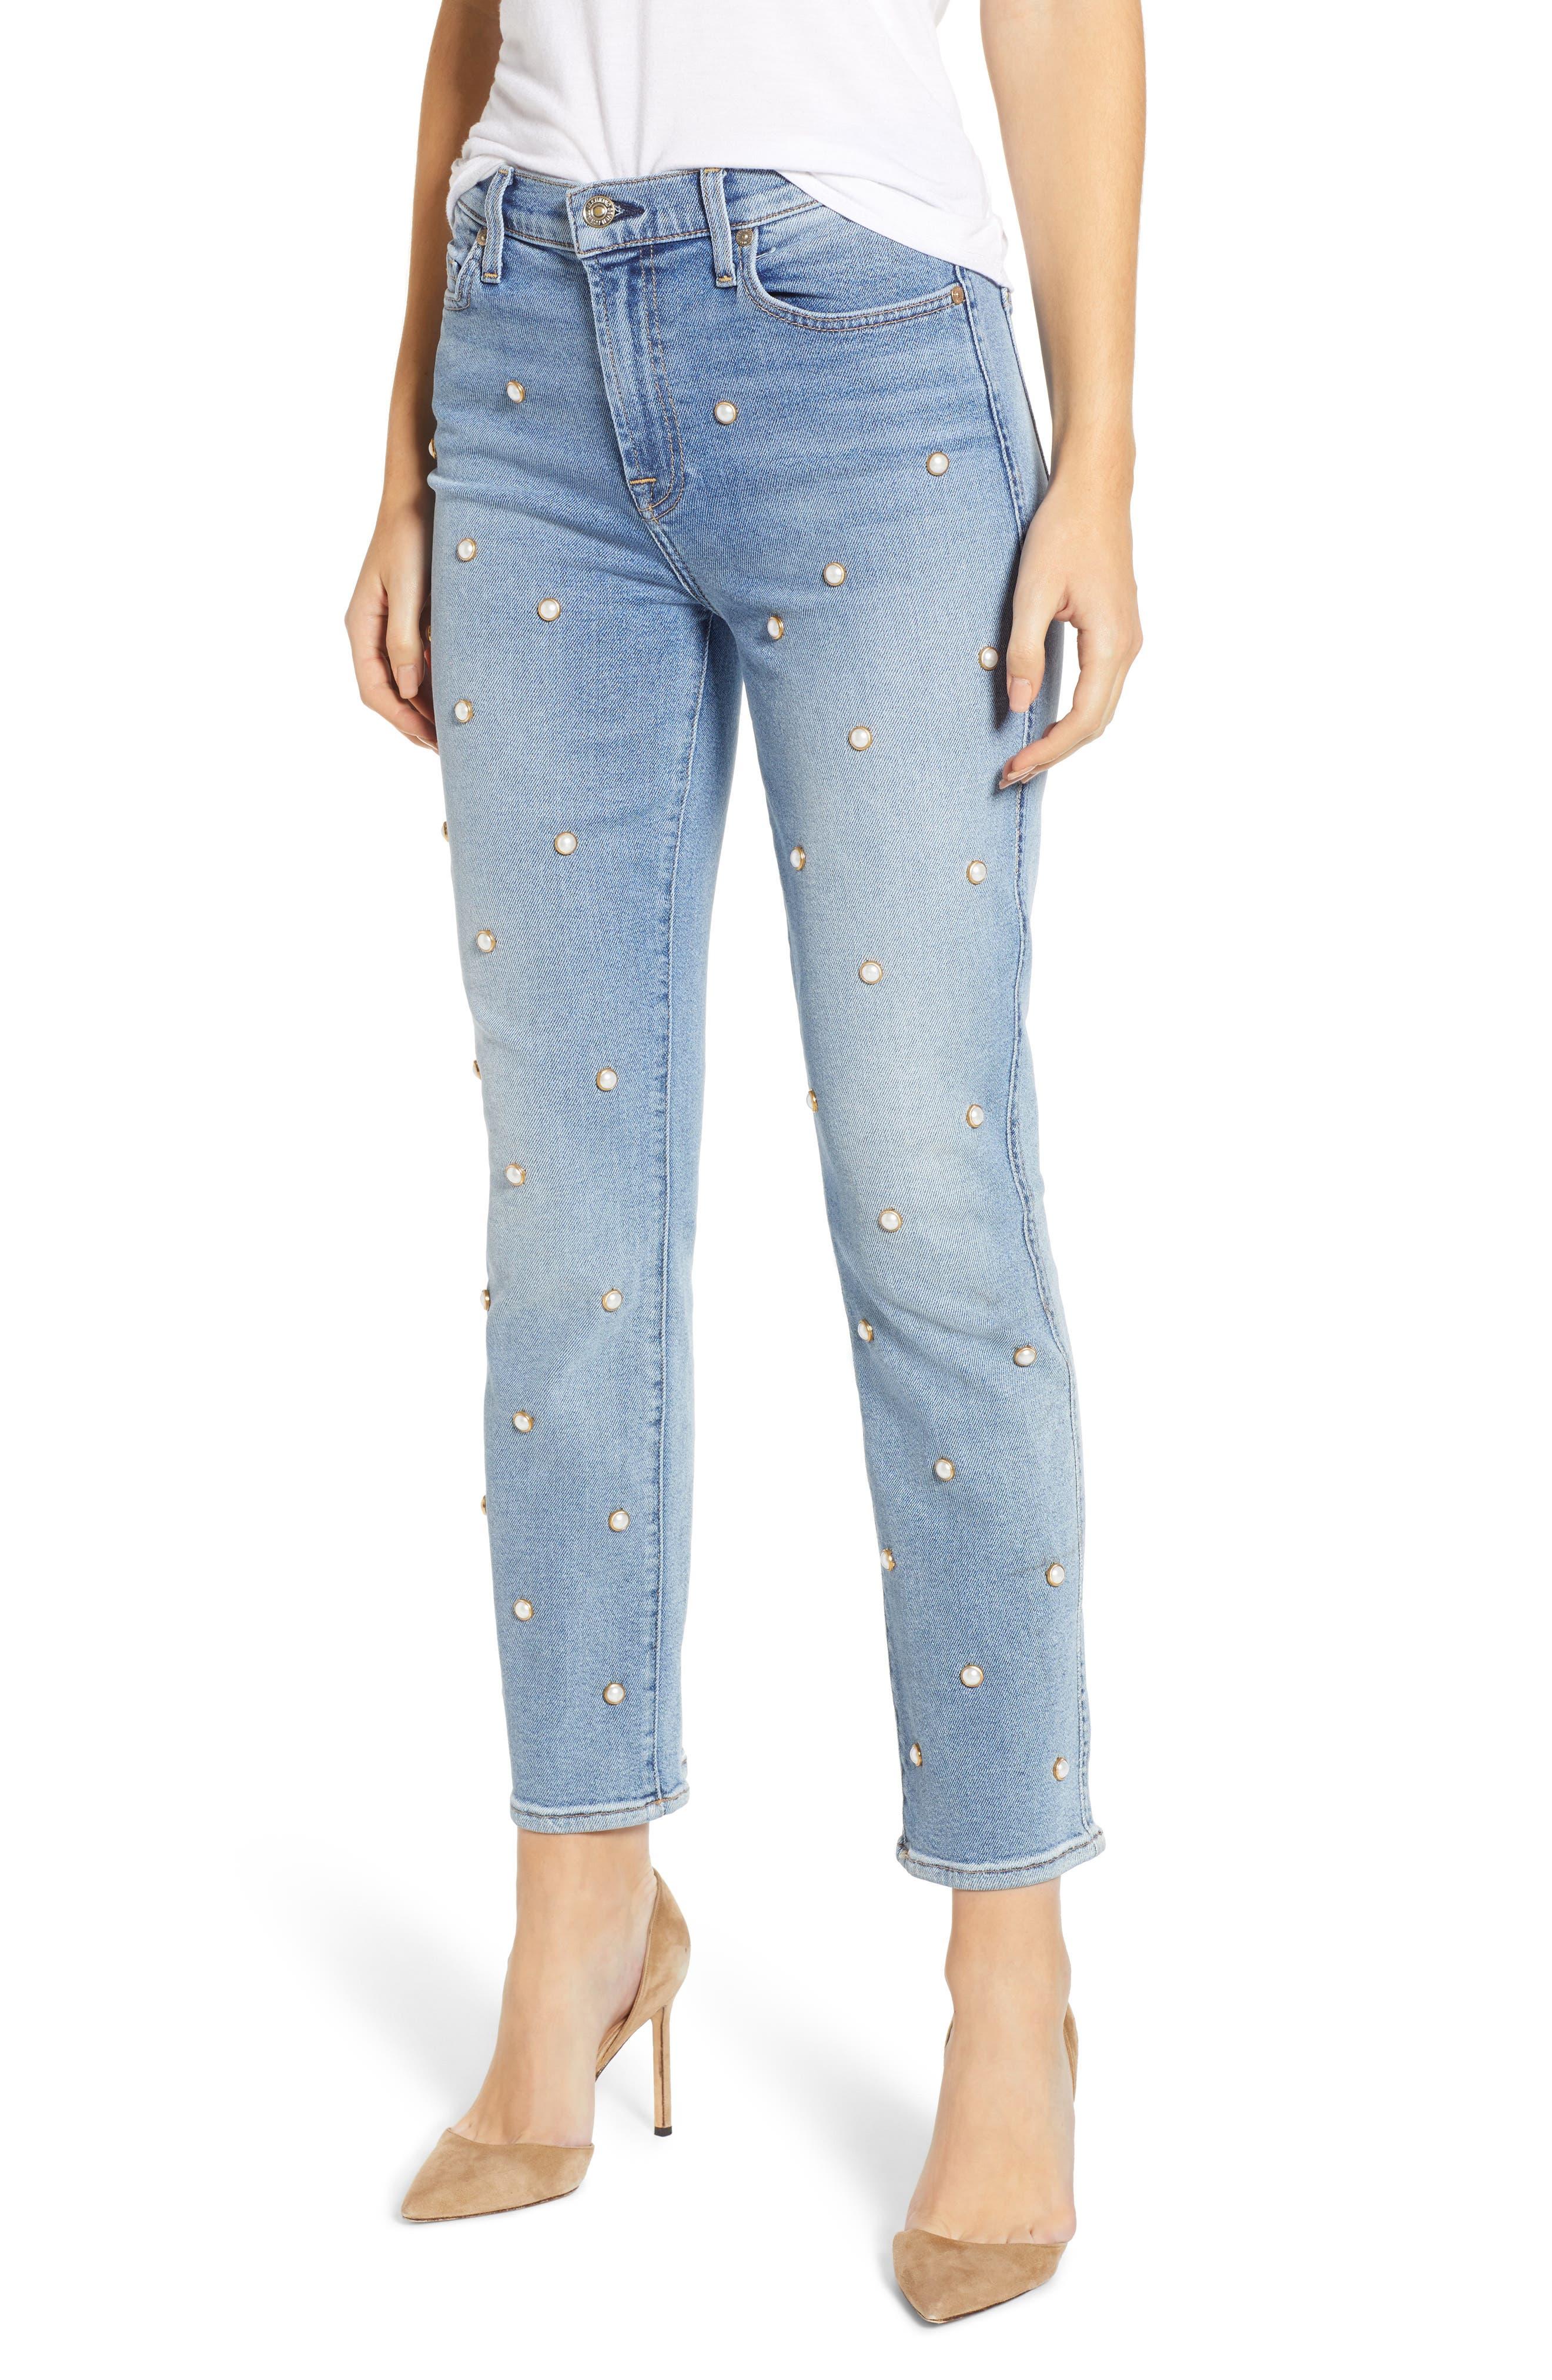 Edie Faux Pearl Detail Ankle Jeans, Main, color, LUXE VINTAGE FLORA